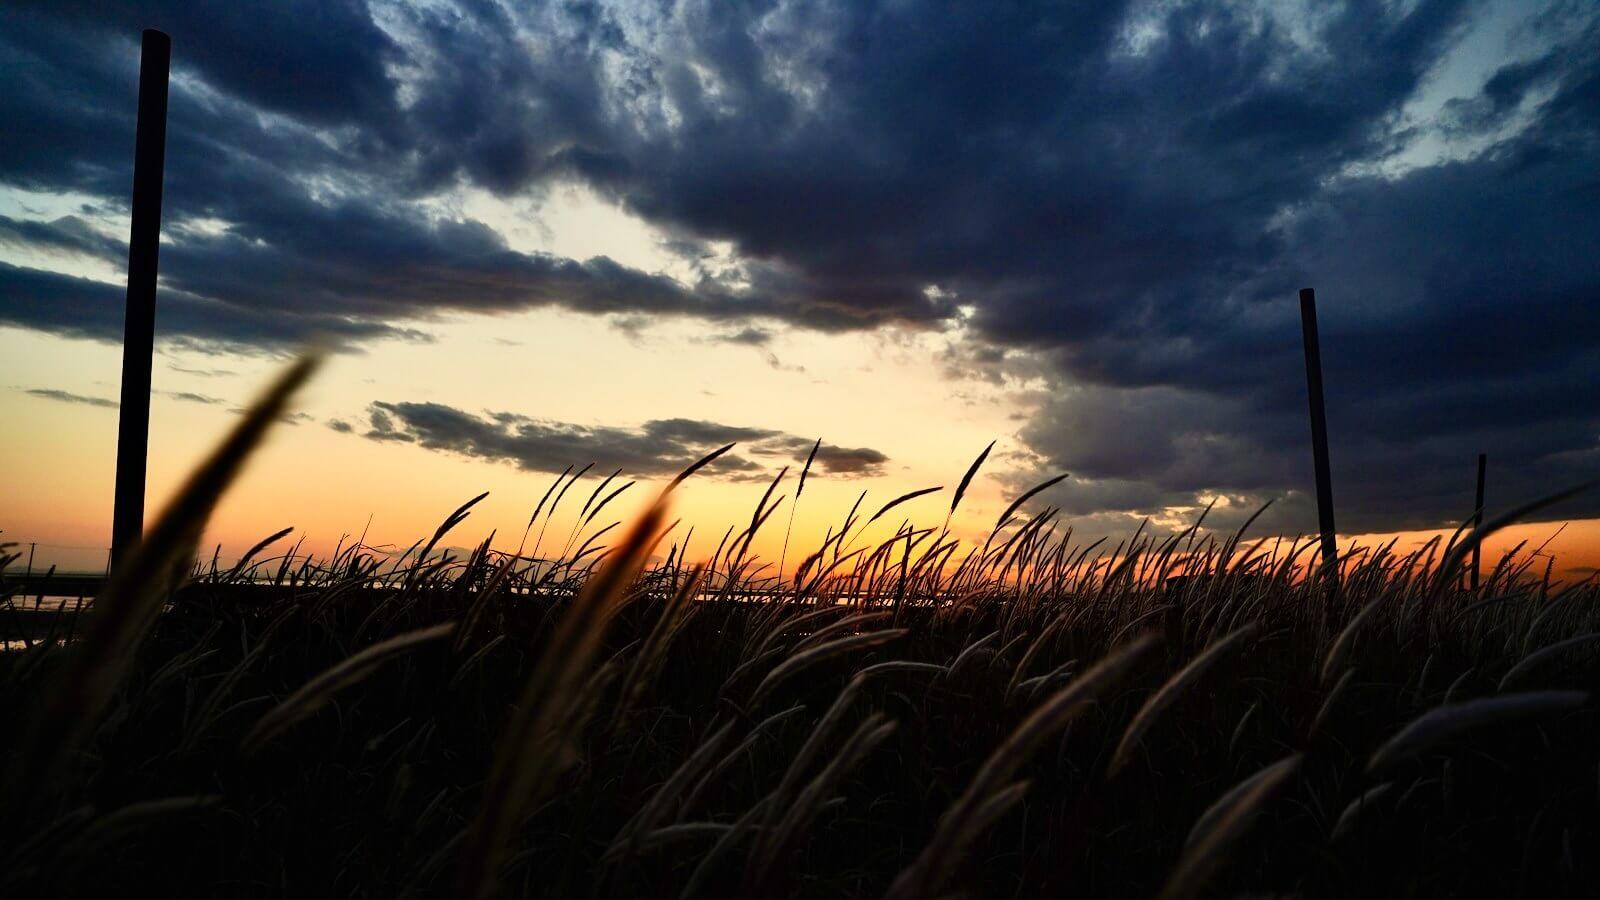 Kuzuma coast at dusk